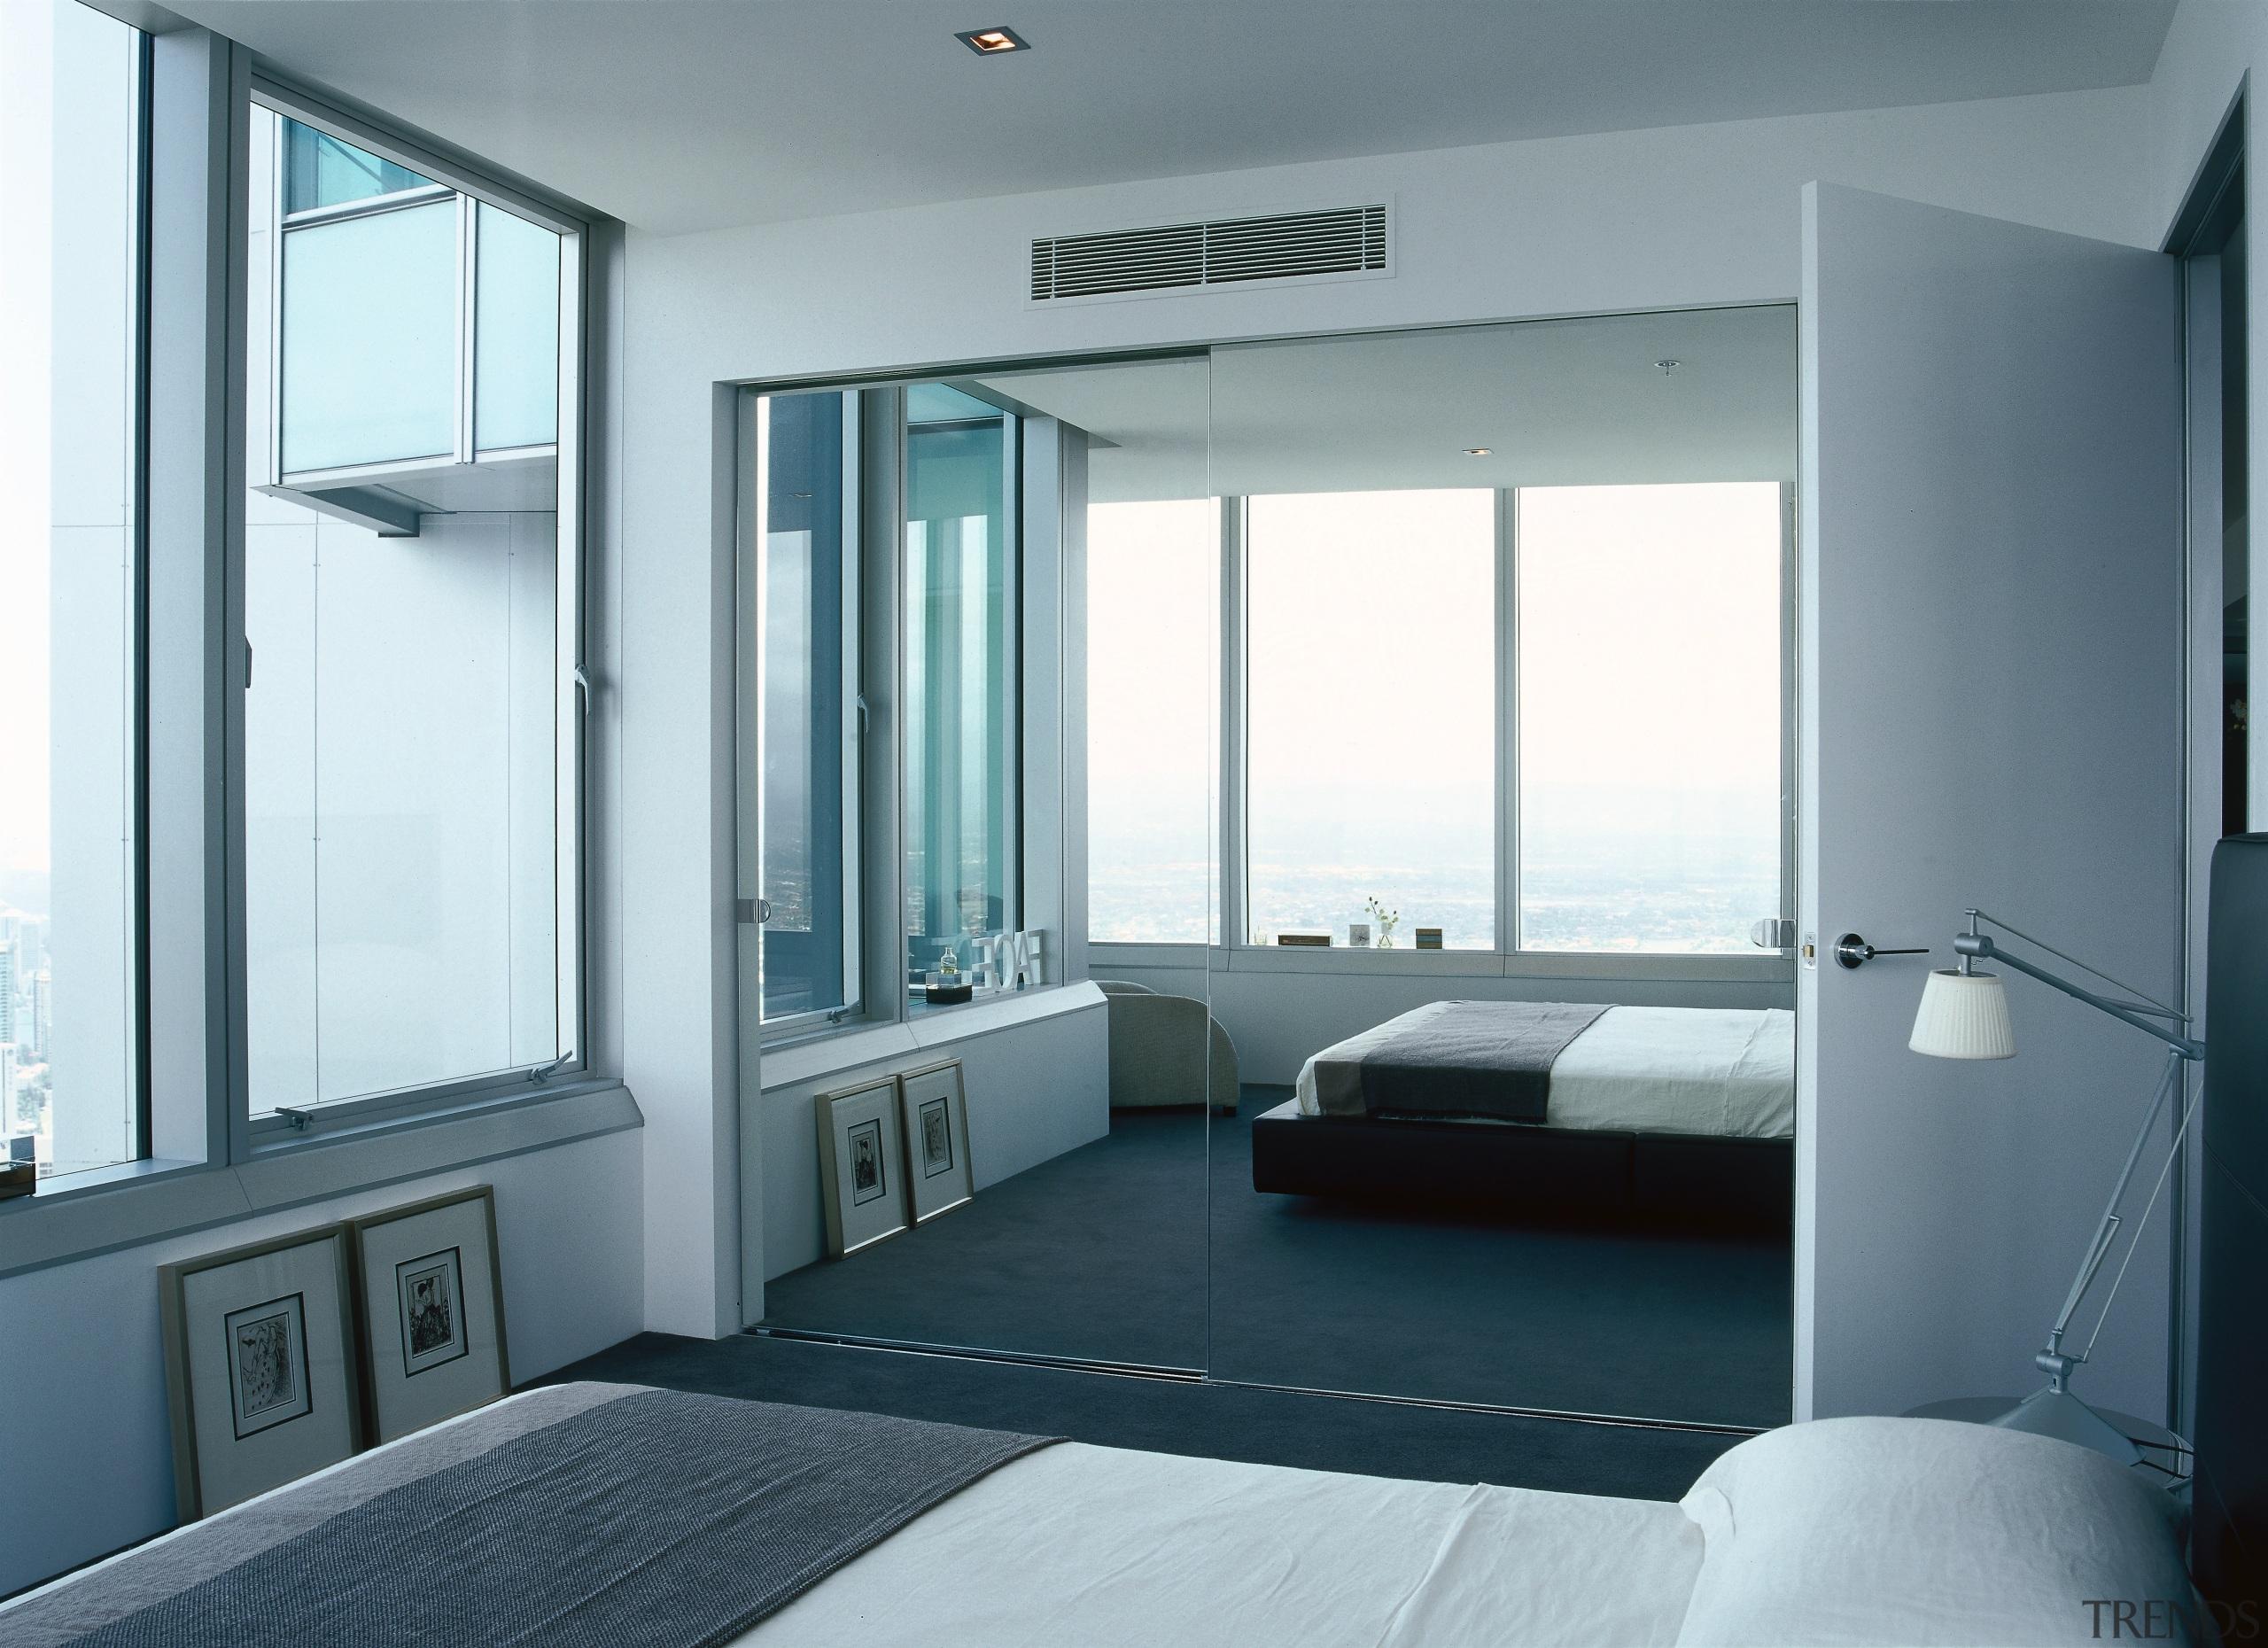 View of mirrored glass of frameless wardrobe doors, architecture, door, interior design, real estate, window, gray, white